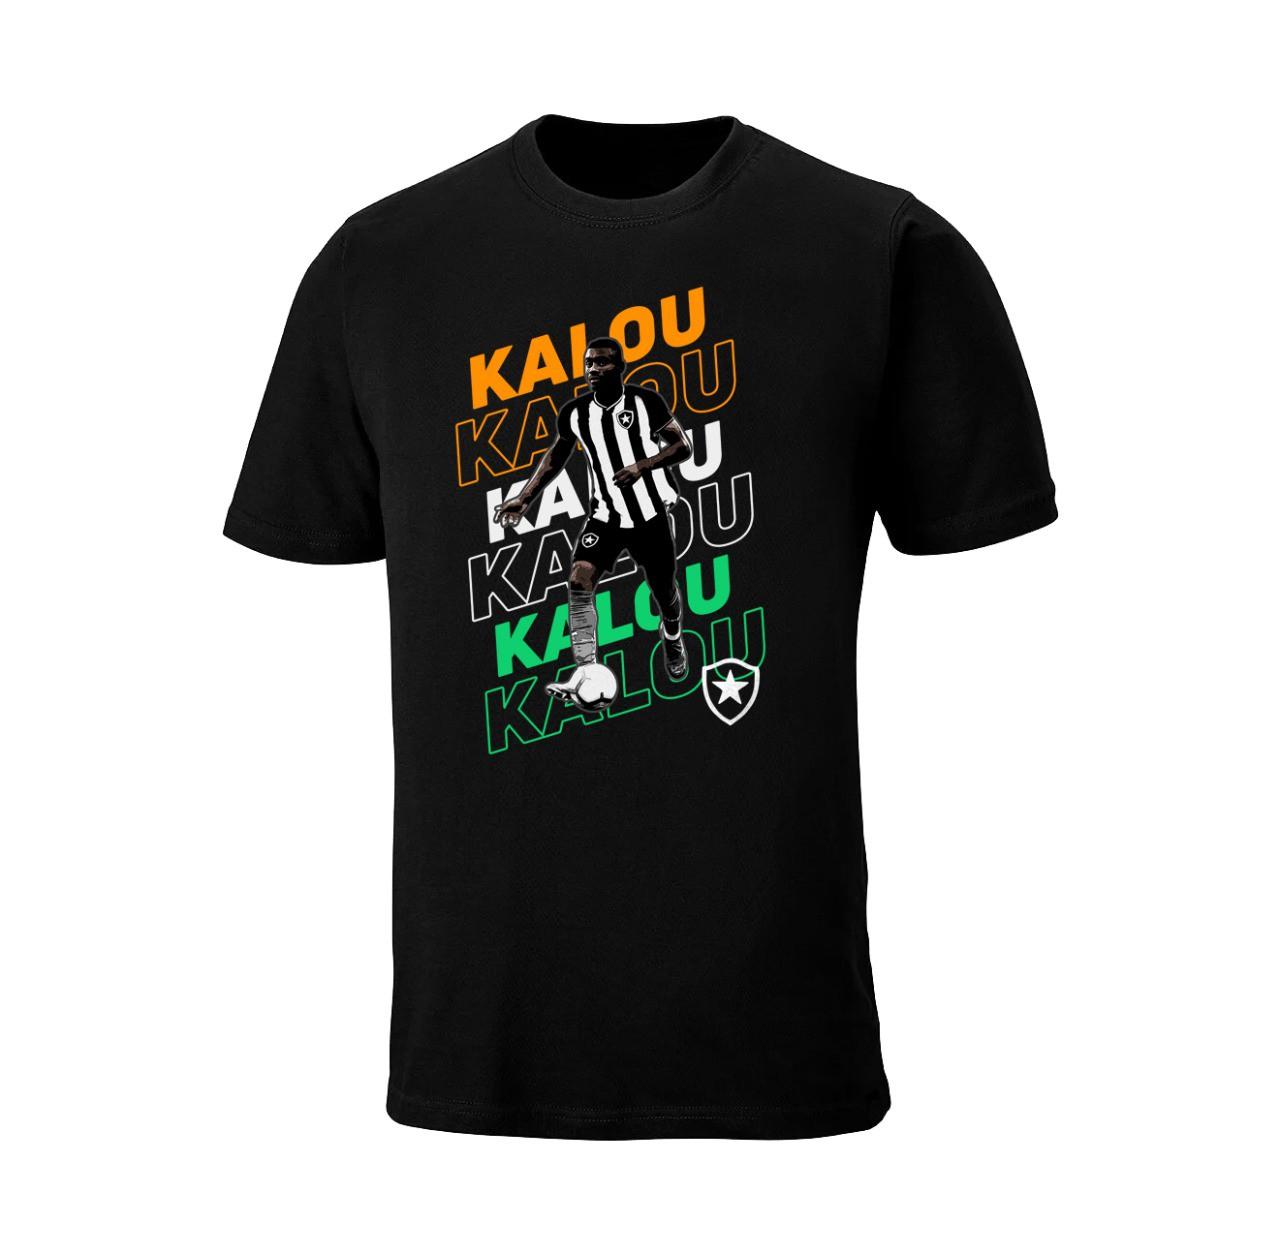 Camiseta Costa do Marfim Masculina